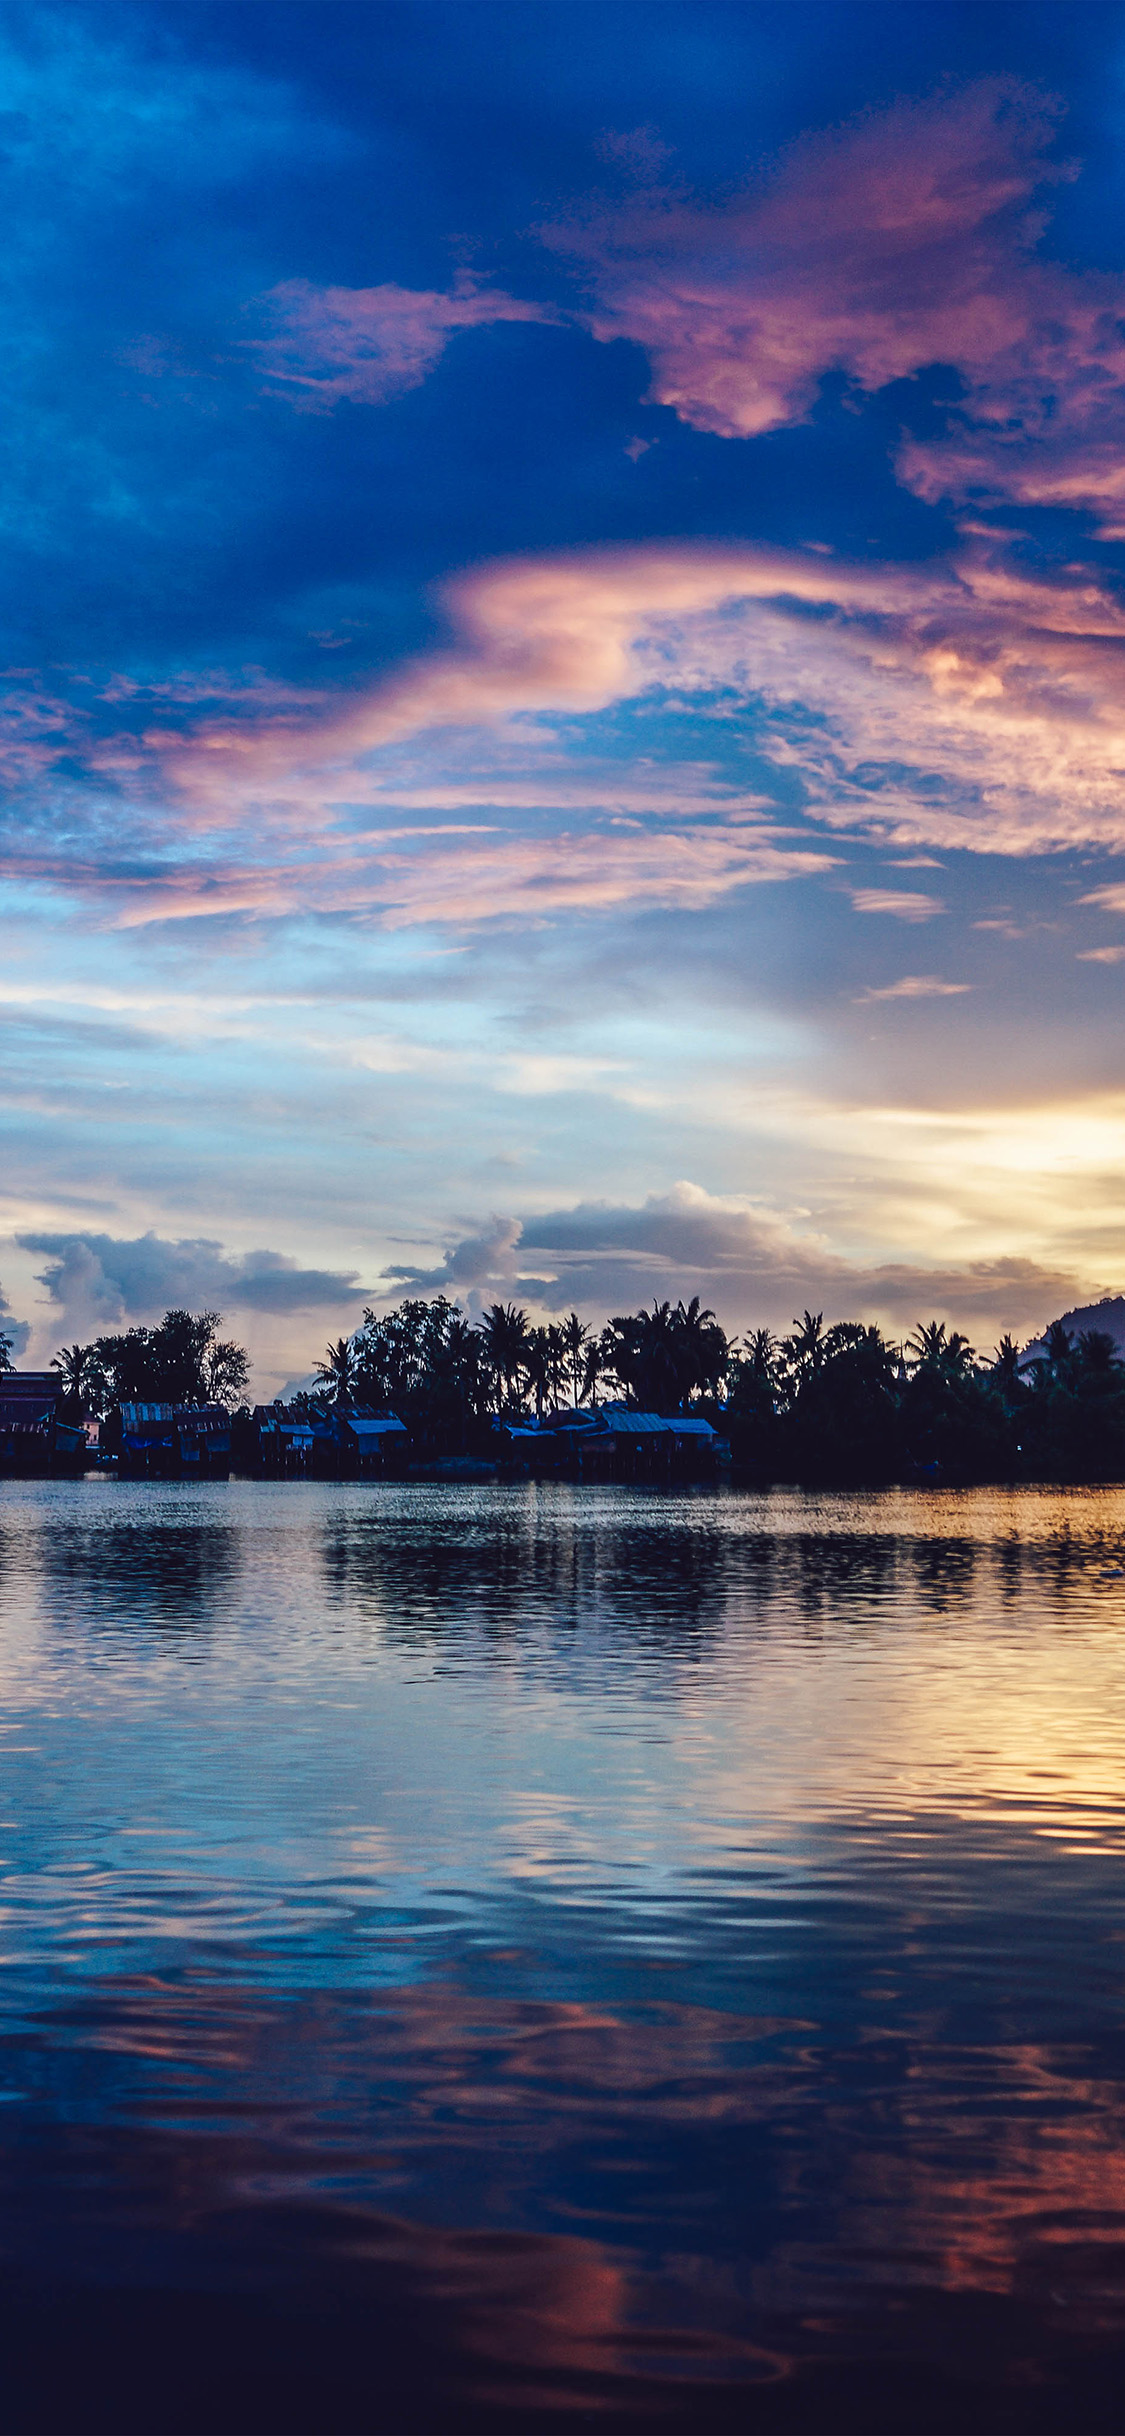 nx17-sunset-river-lake-beautiful-nature-wallpaper